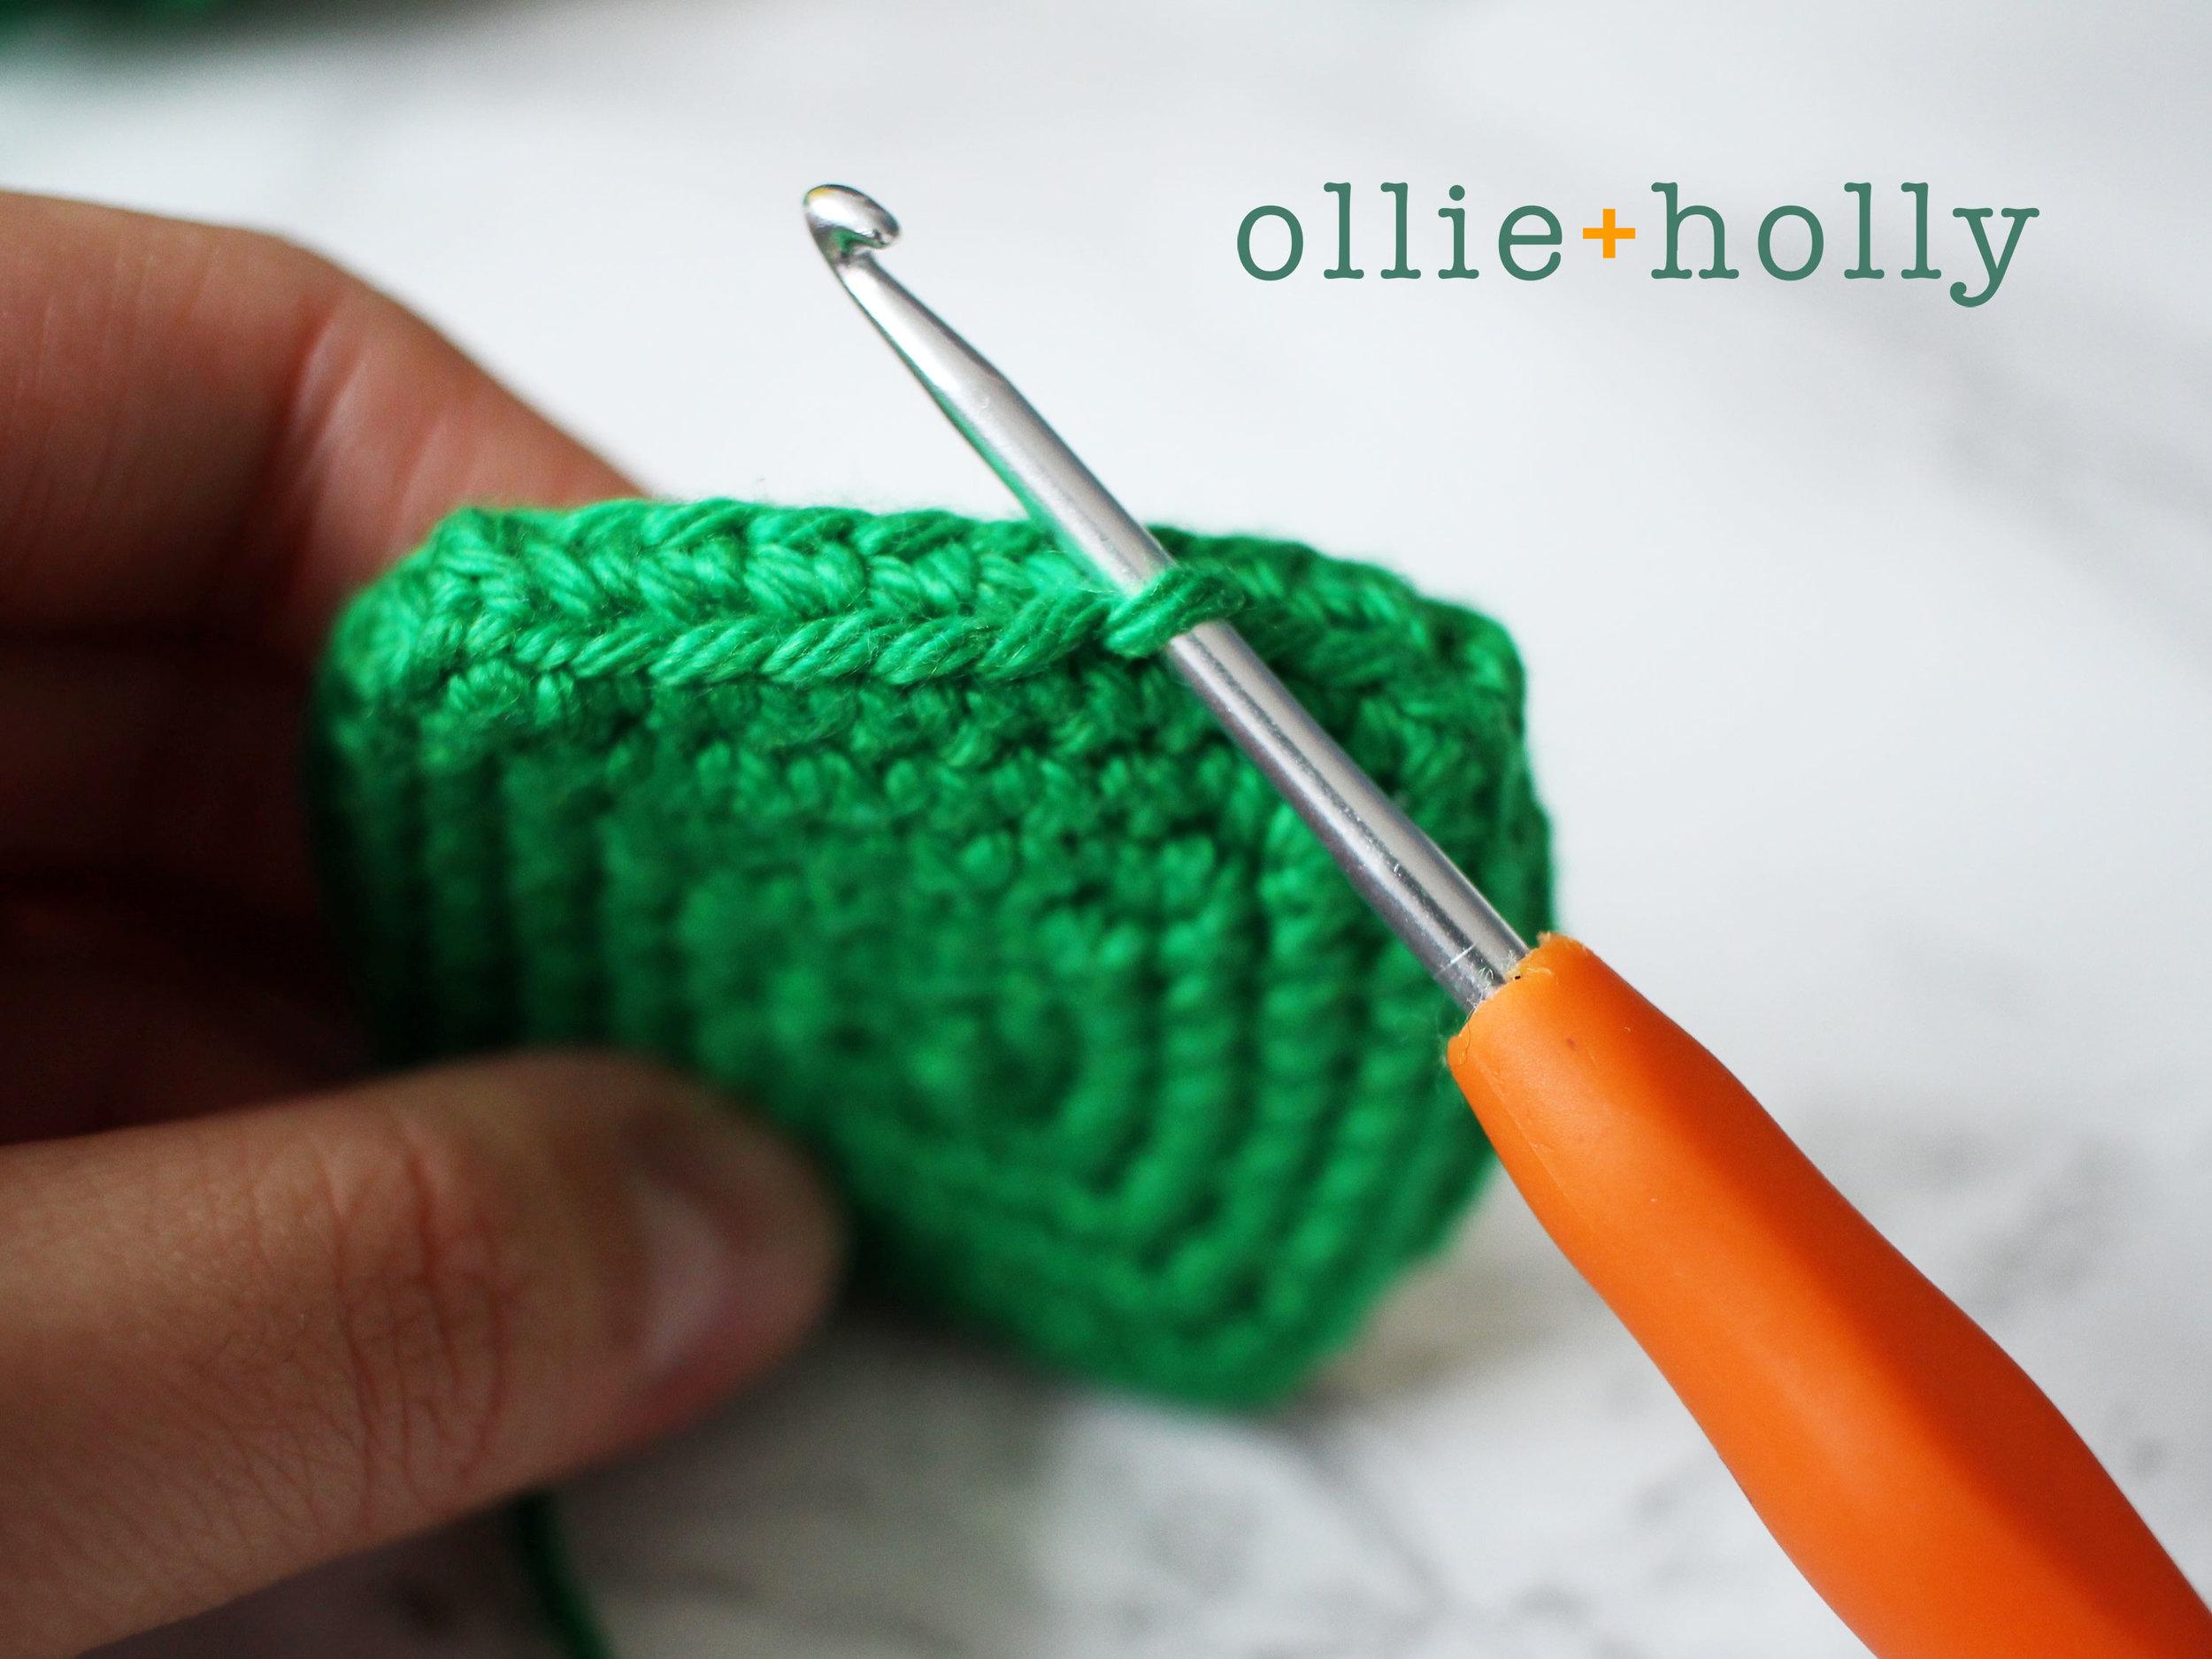 Toronto Green Bin Amigurumi Crochet Pattern Step 4